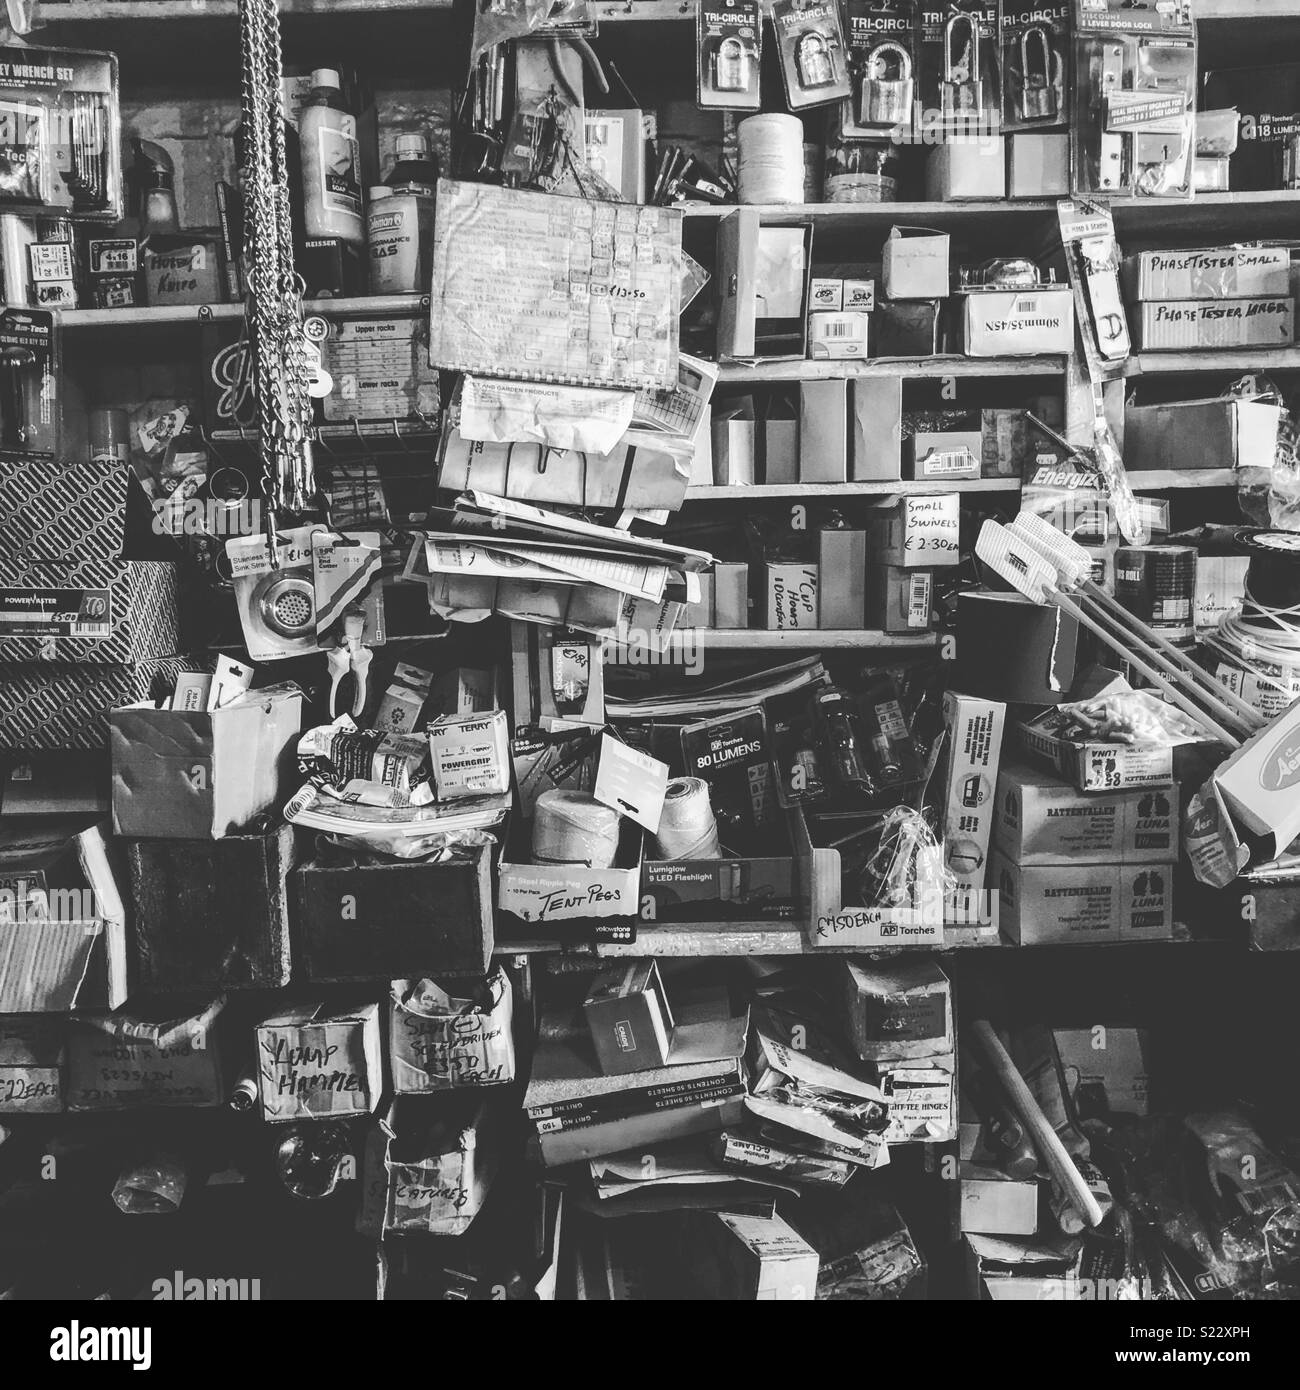 Junk Shop Imagen De Stock